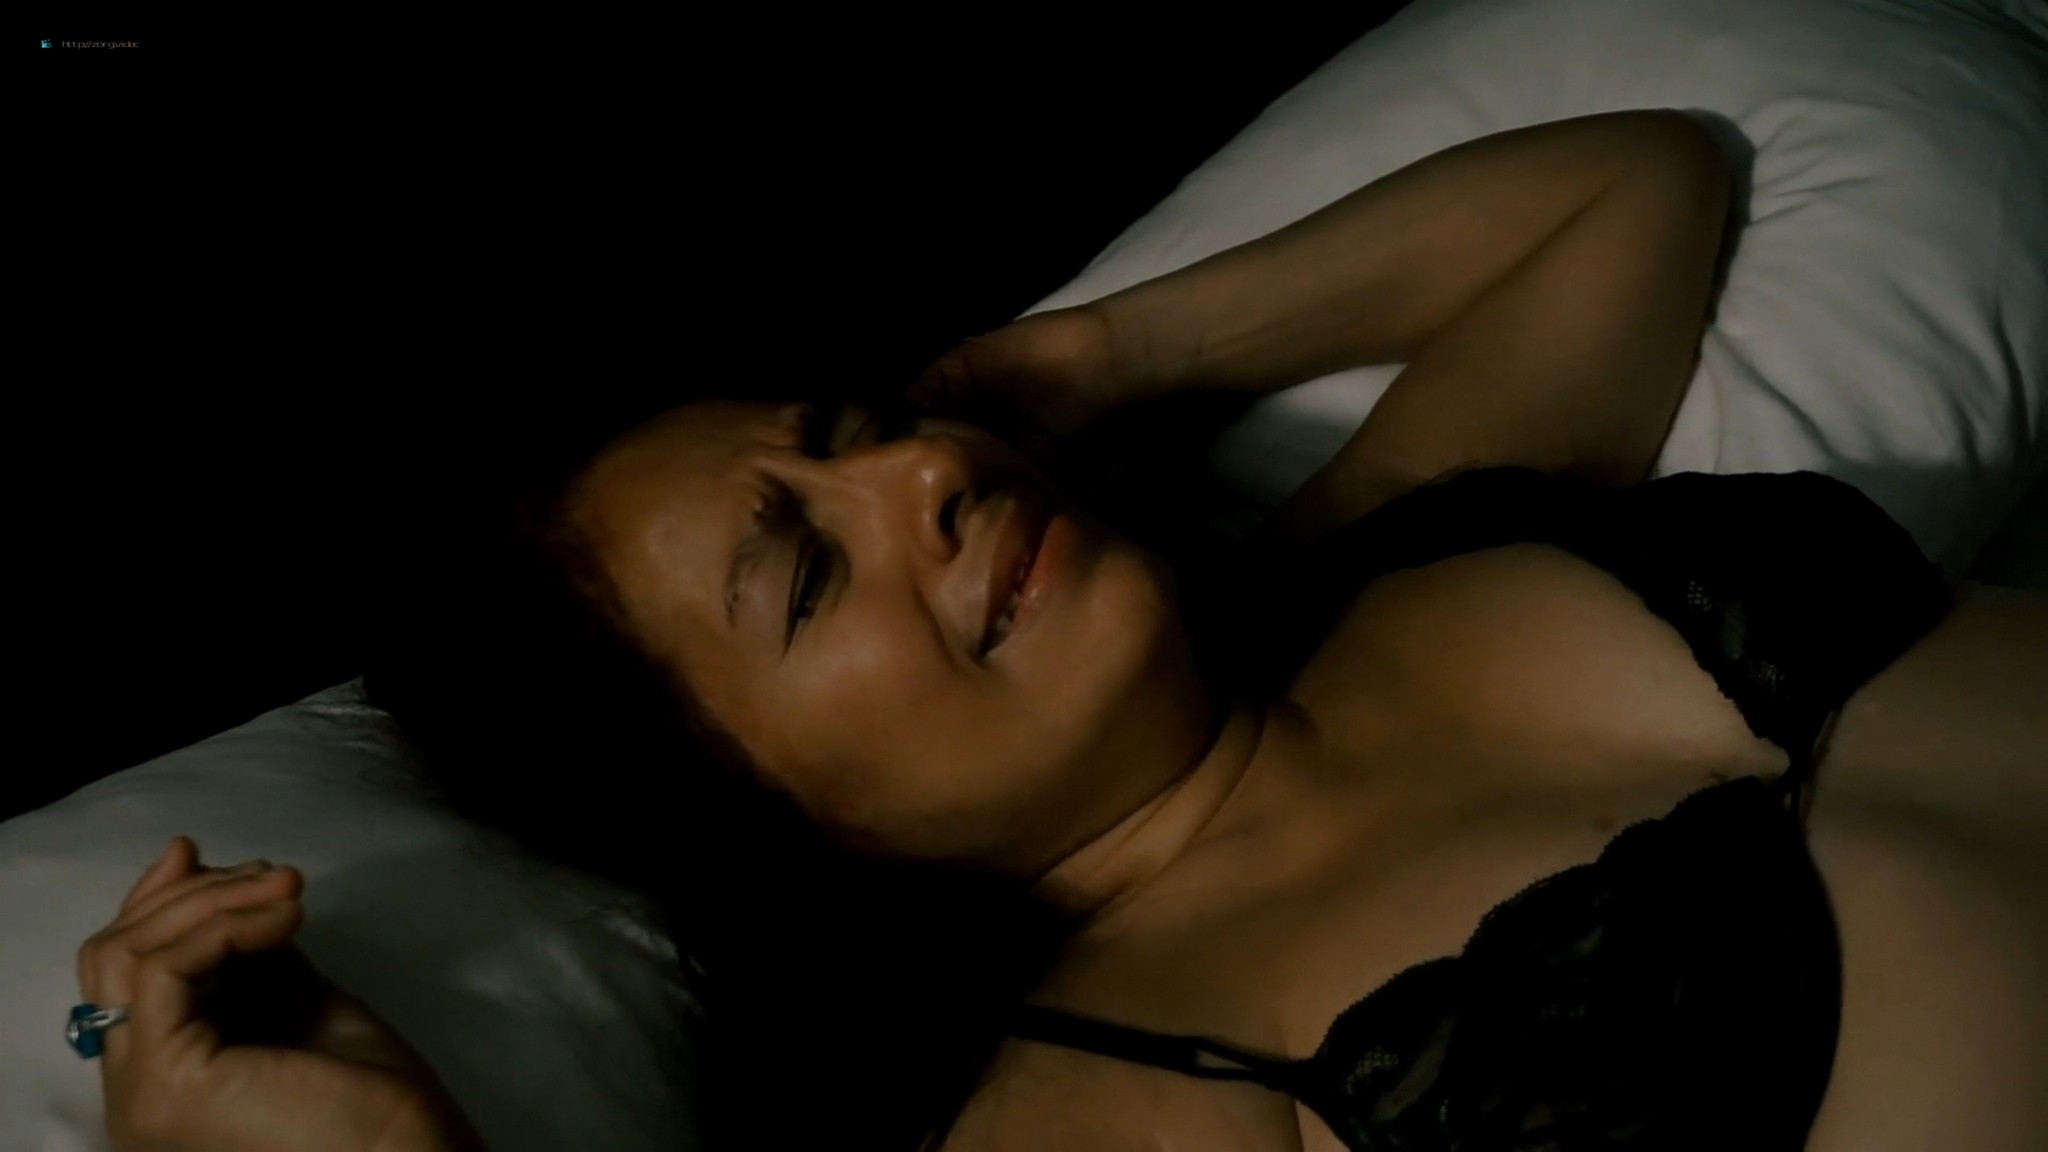 Ella Stryker nude Jeannie Ramirez and others sex nude too - Joel (2018) HD 1080p Web (2)